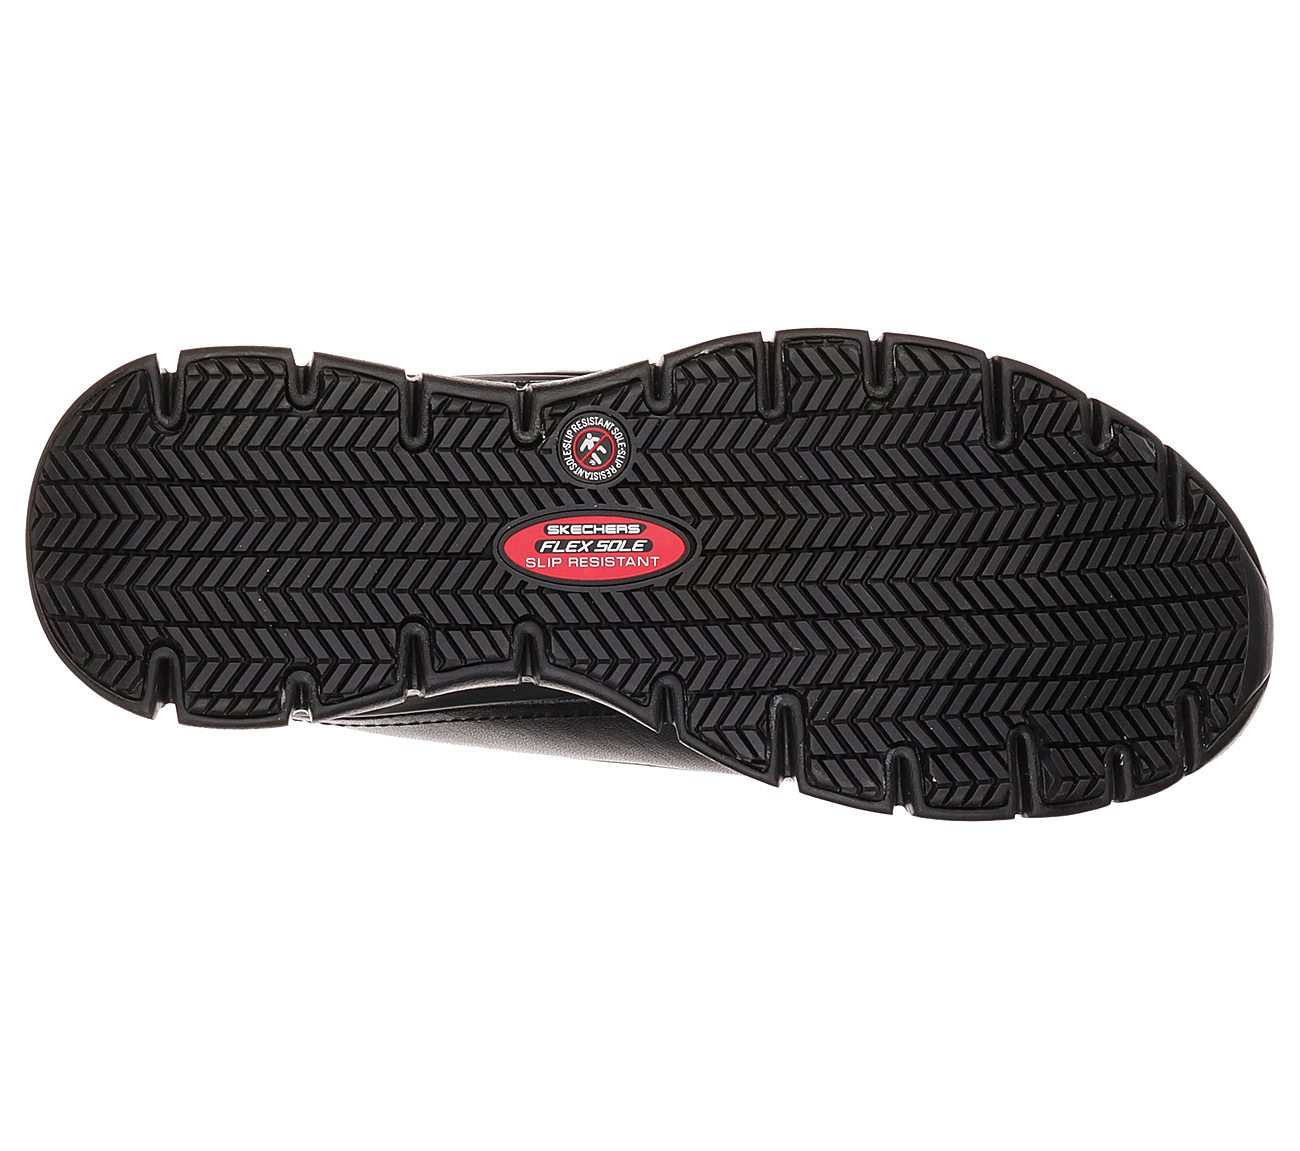 slip resistant skechers